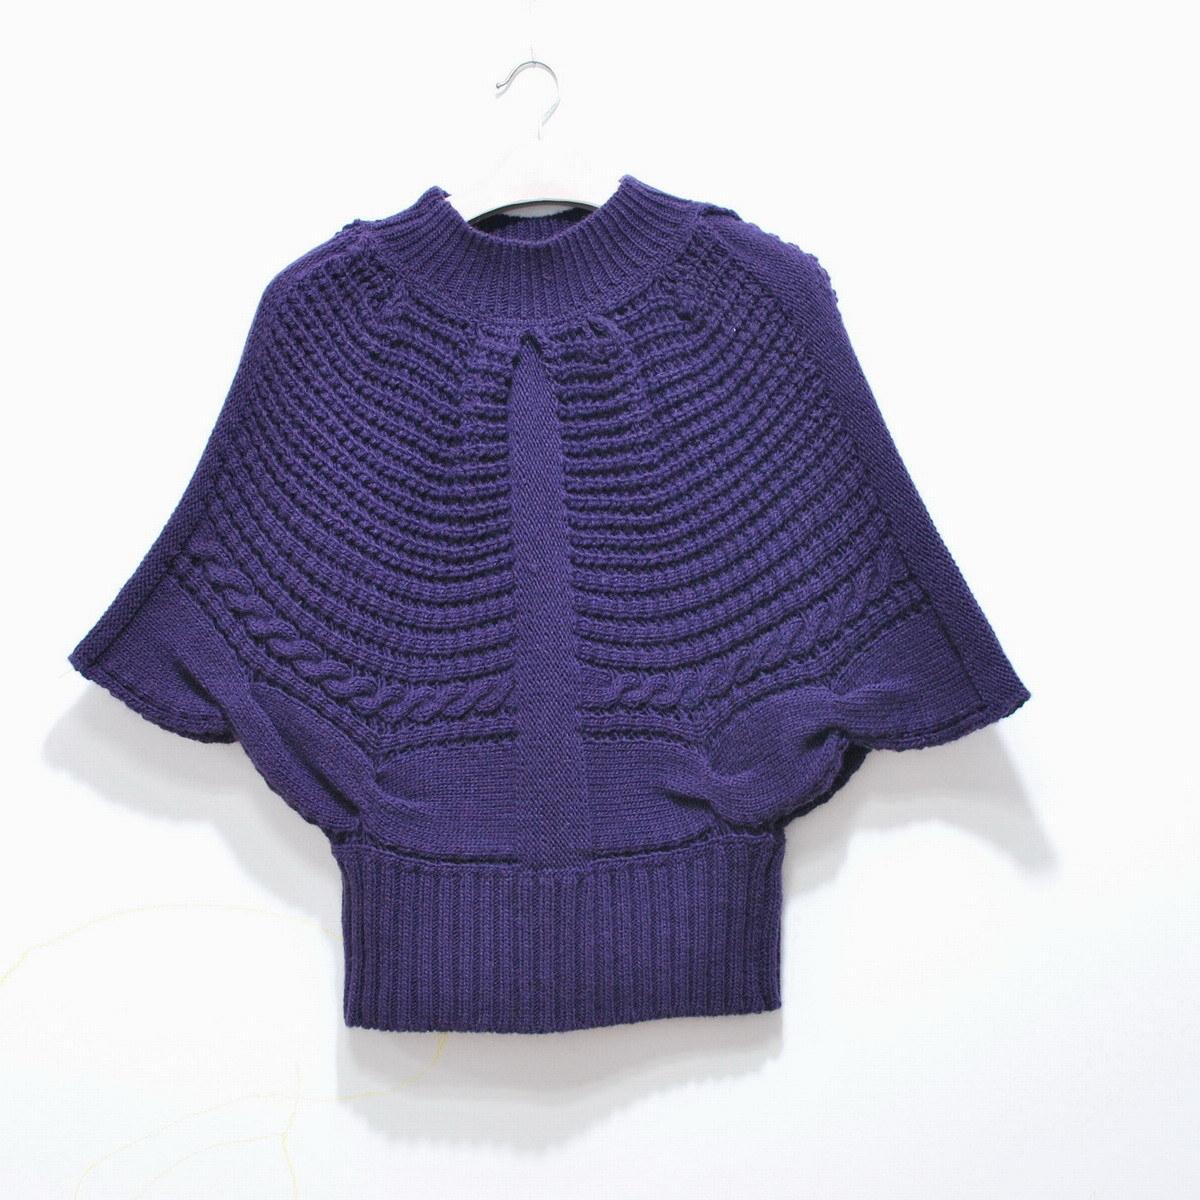 Knitting Pattern For Dolman Sleeve Sweater : China Lady?s Dolman Sleeve Knitted Sweater (X -S011 ...